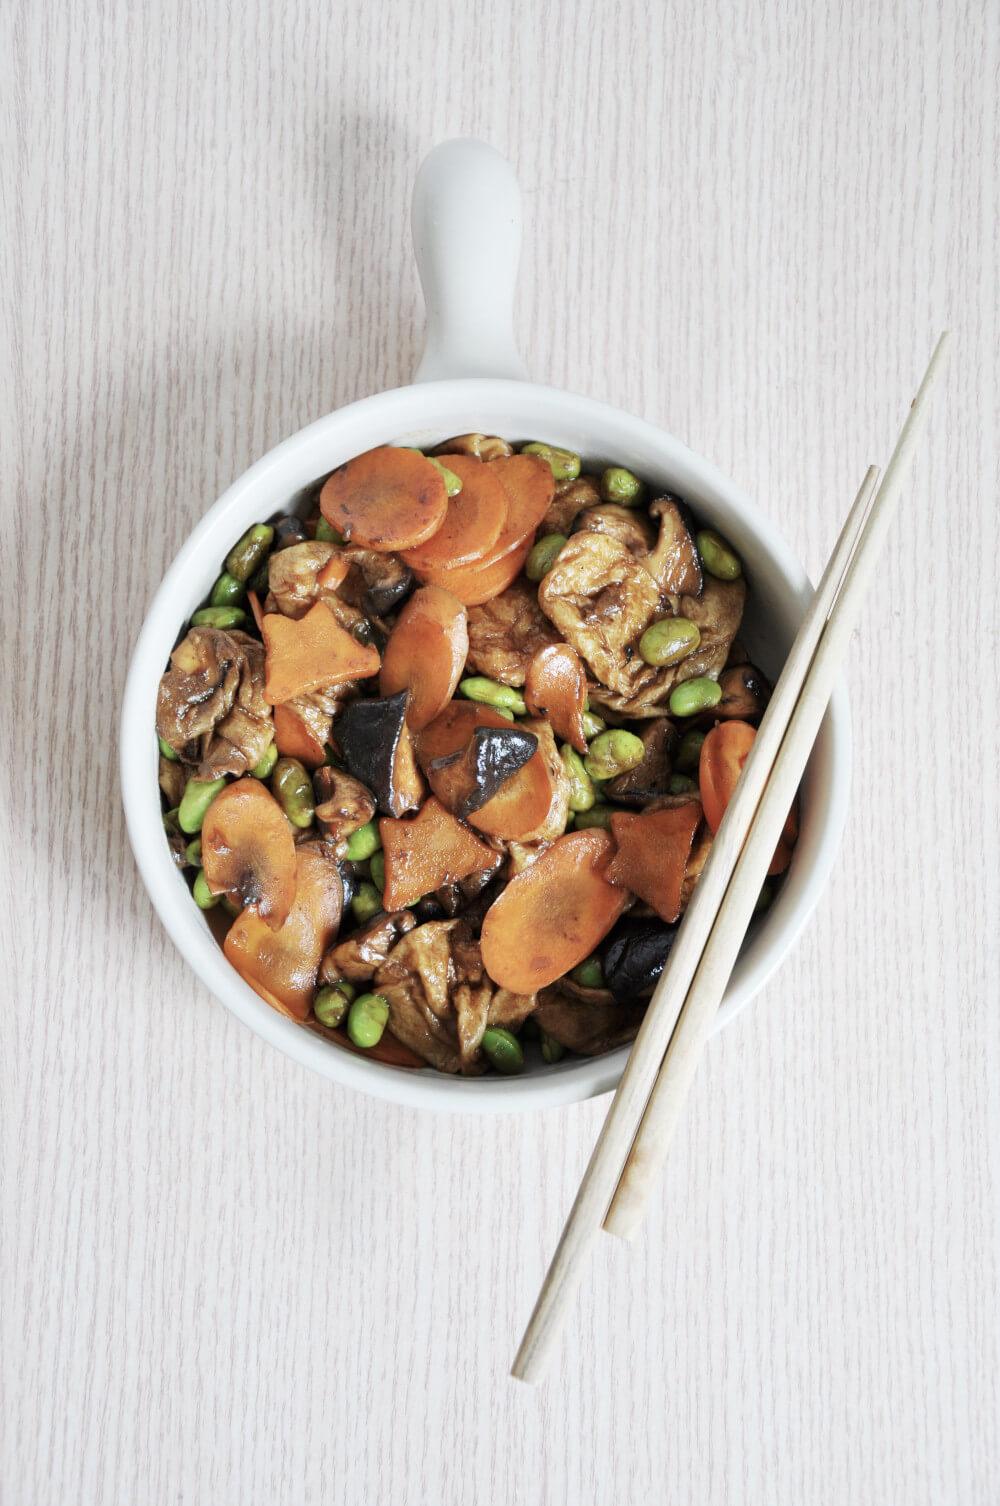 seitan balls with edamame beans, mushrooms and carrot